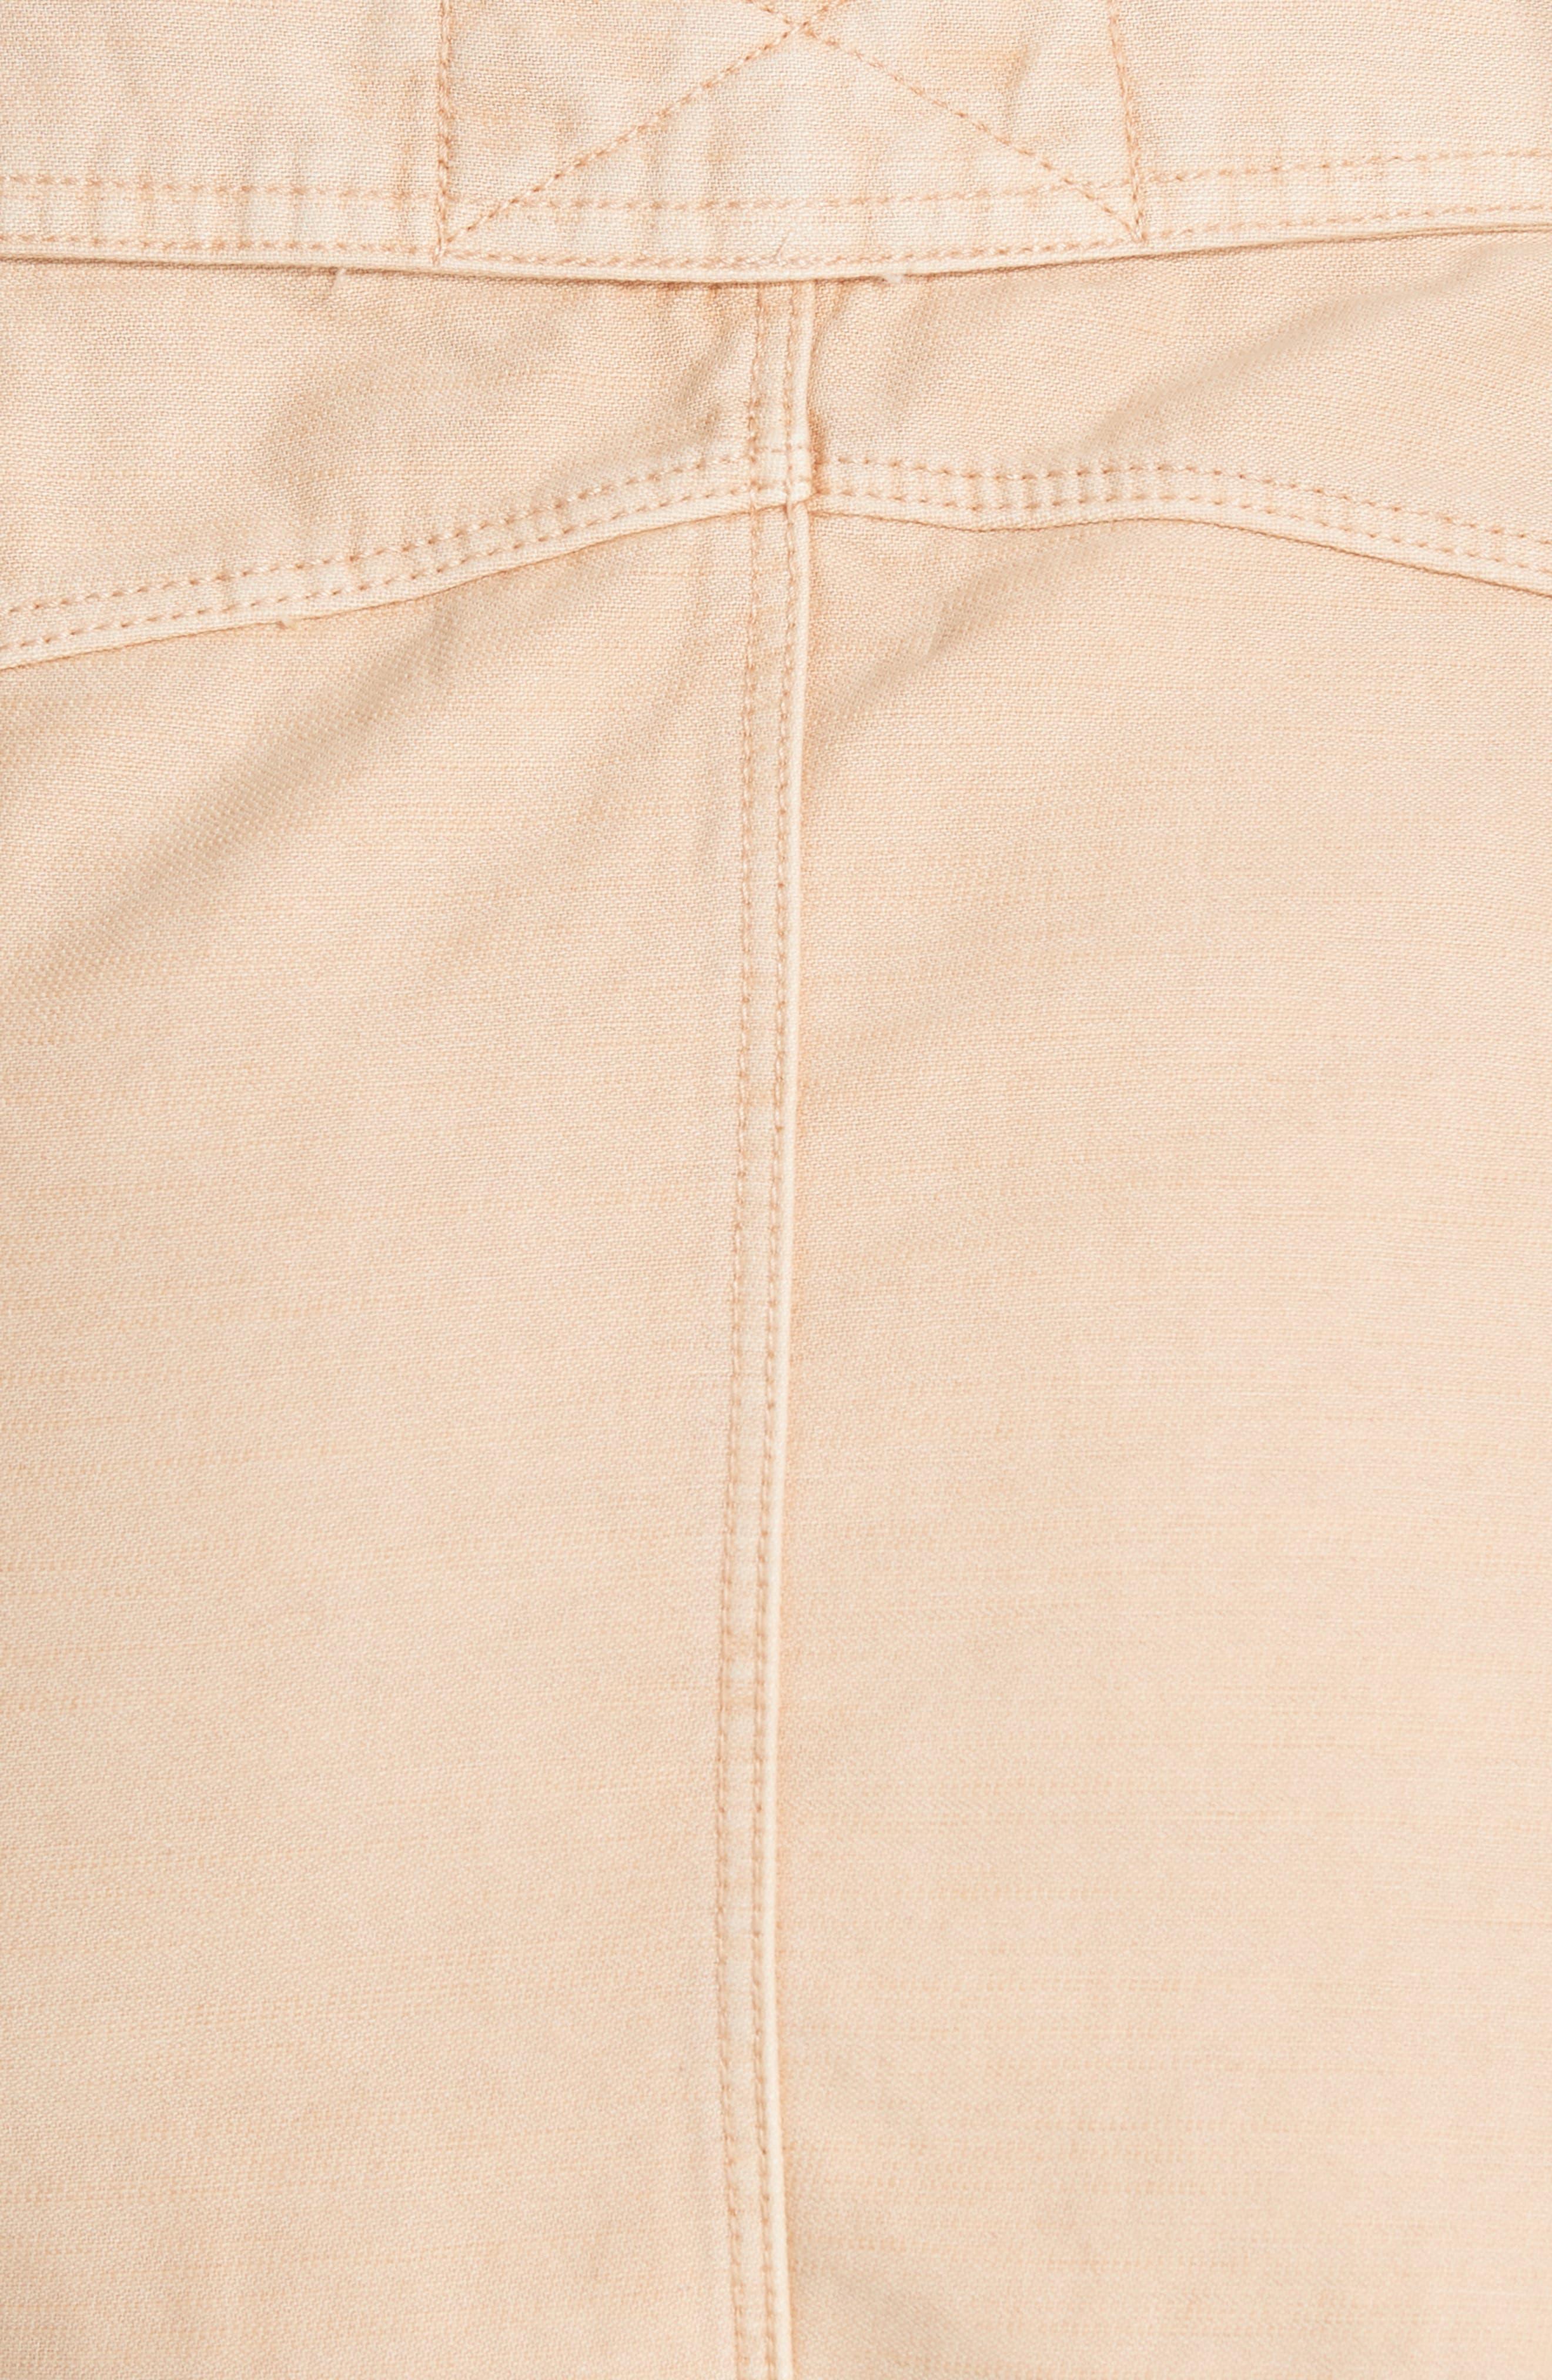 Hangin' On Tight Miniskirt,                             Alternate thumbnail 9, color,